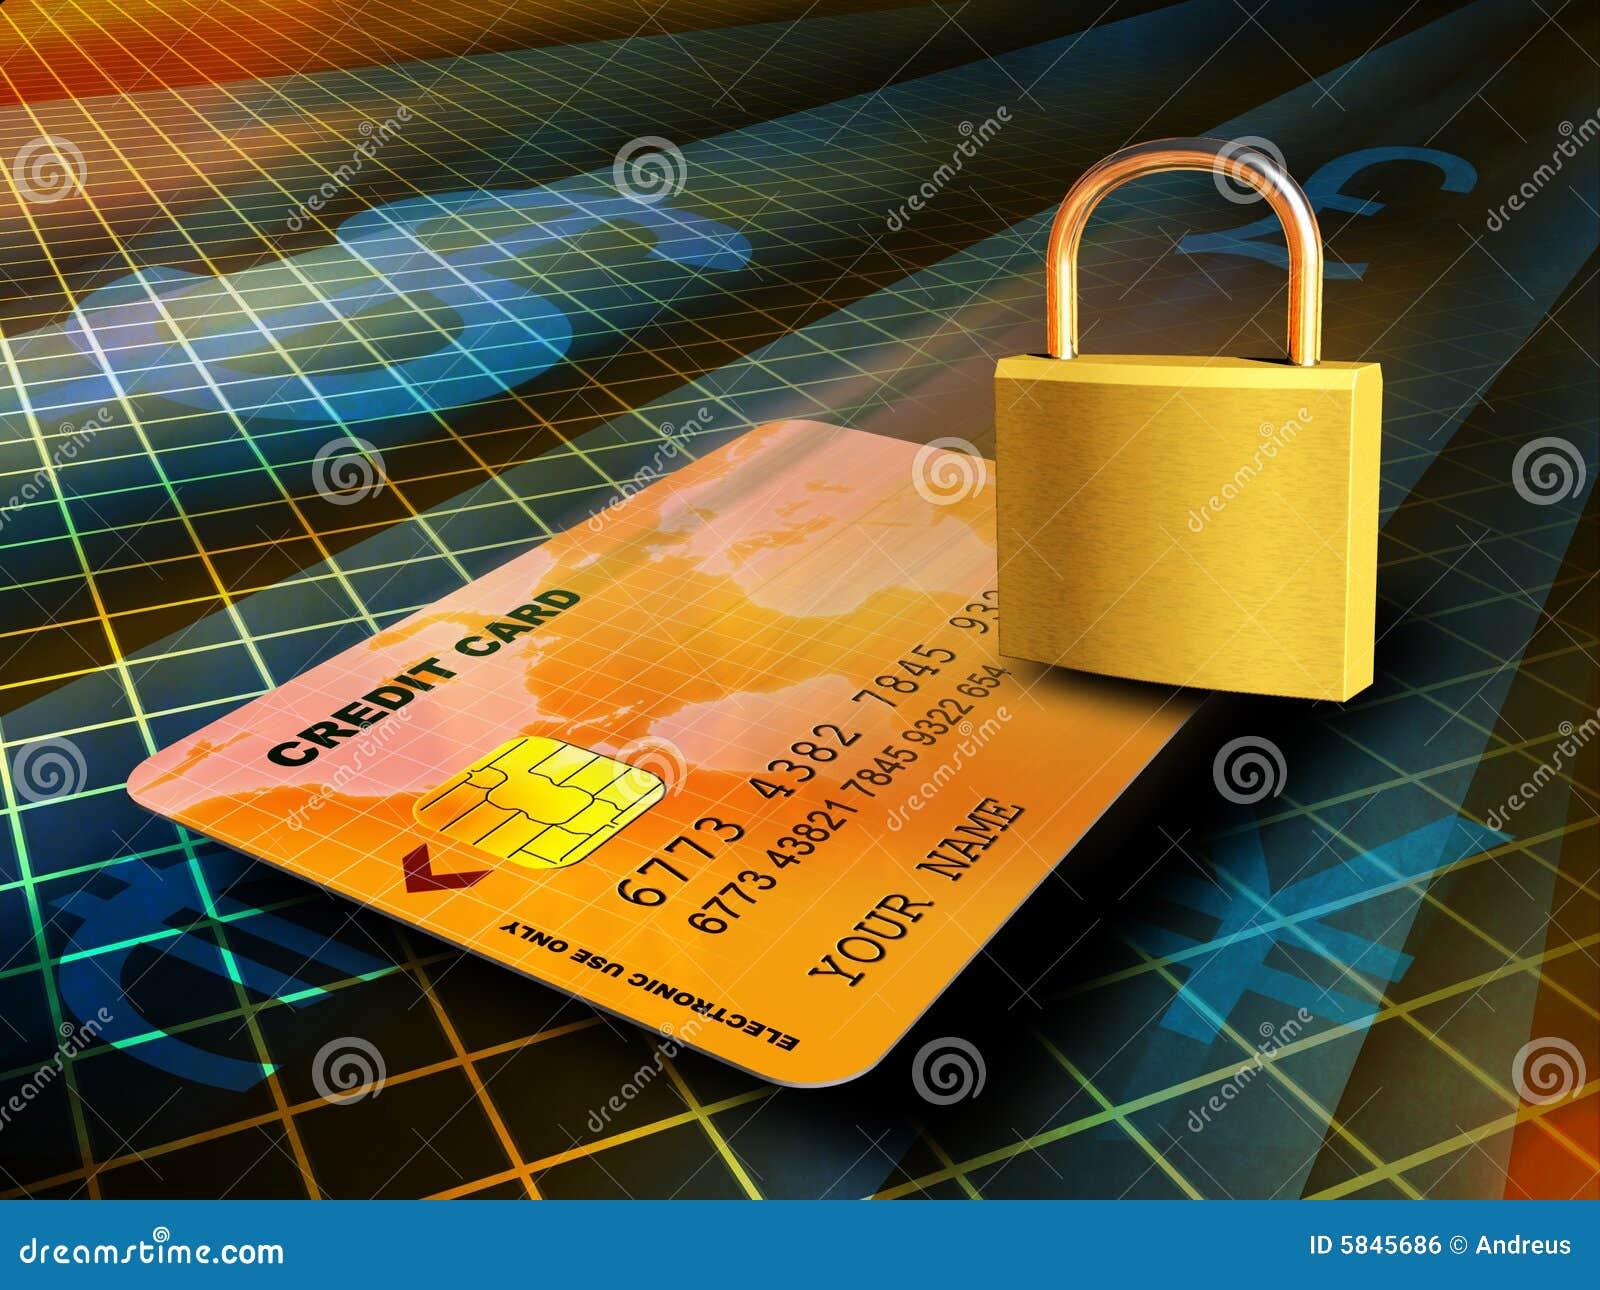 Online Transaction Royalty Free Stock Image - Image: 5845686